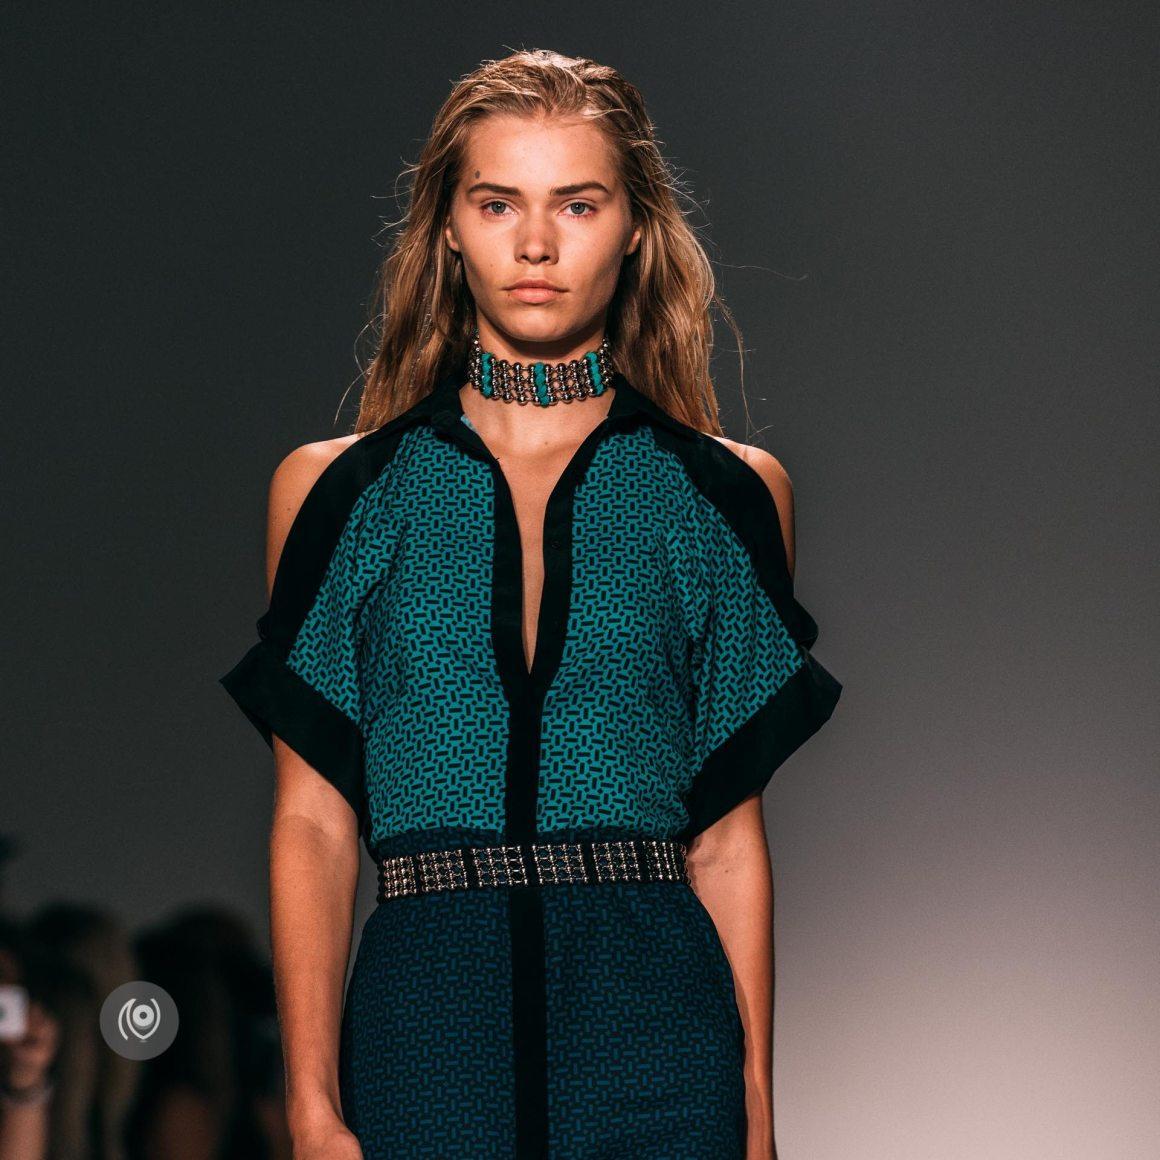 Ohne Titel SS16, New York Fashion Week, #EyesForNewYork #REDHUxNYC Naina.co Luxury & Lifestyle, Photographer Storyteller, Blogger